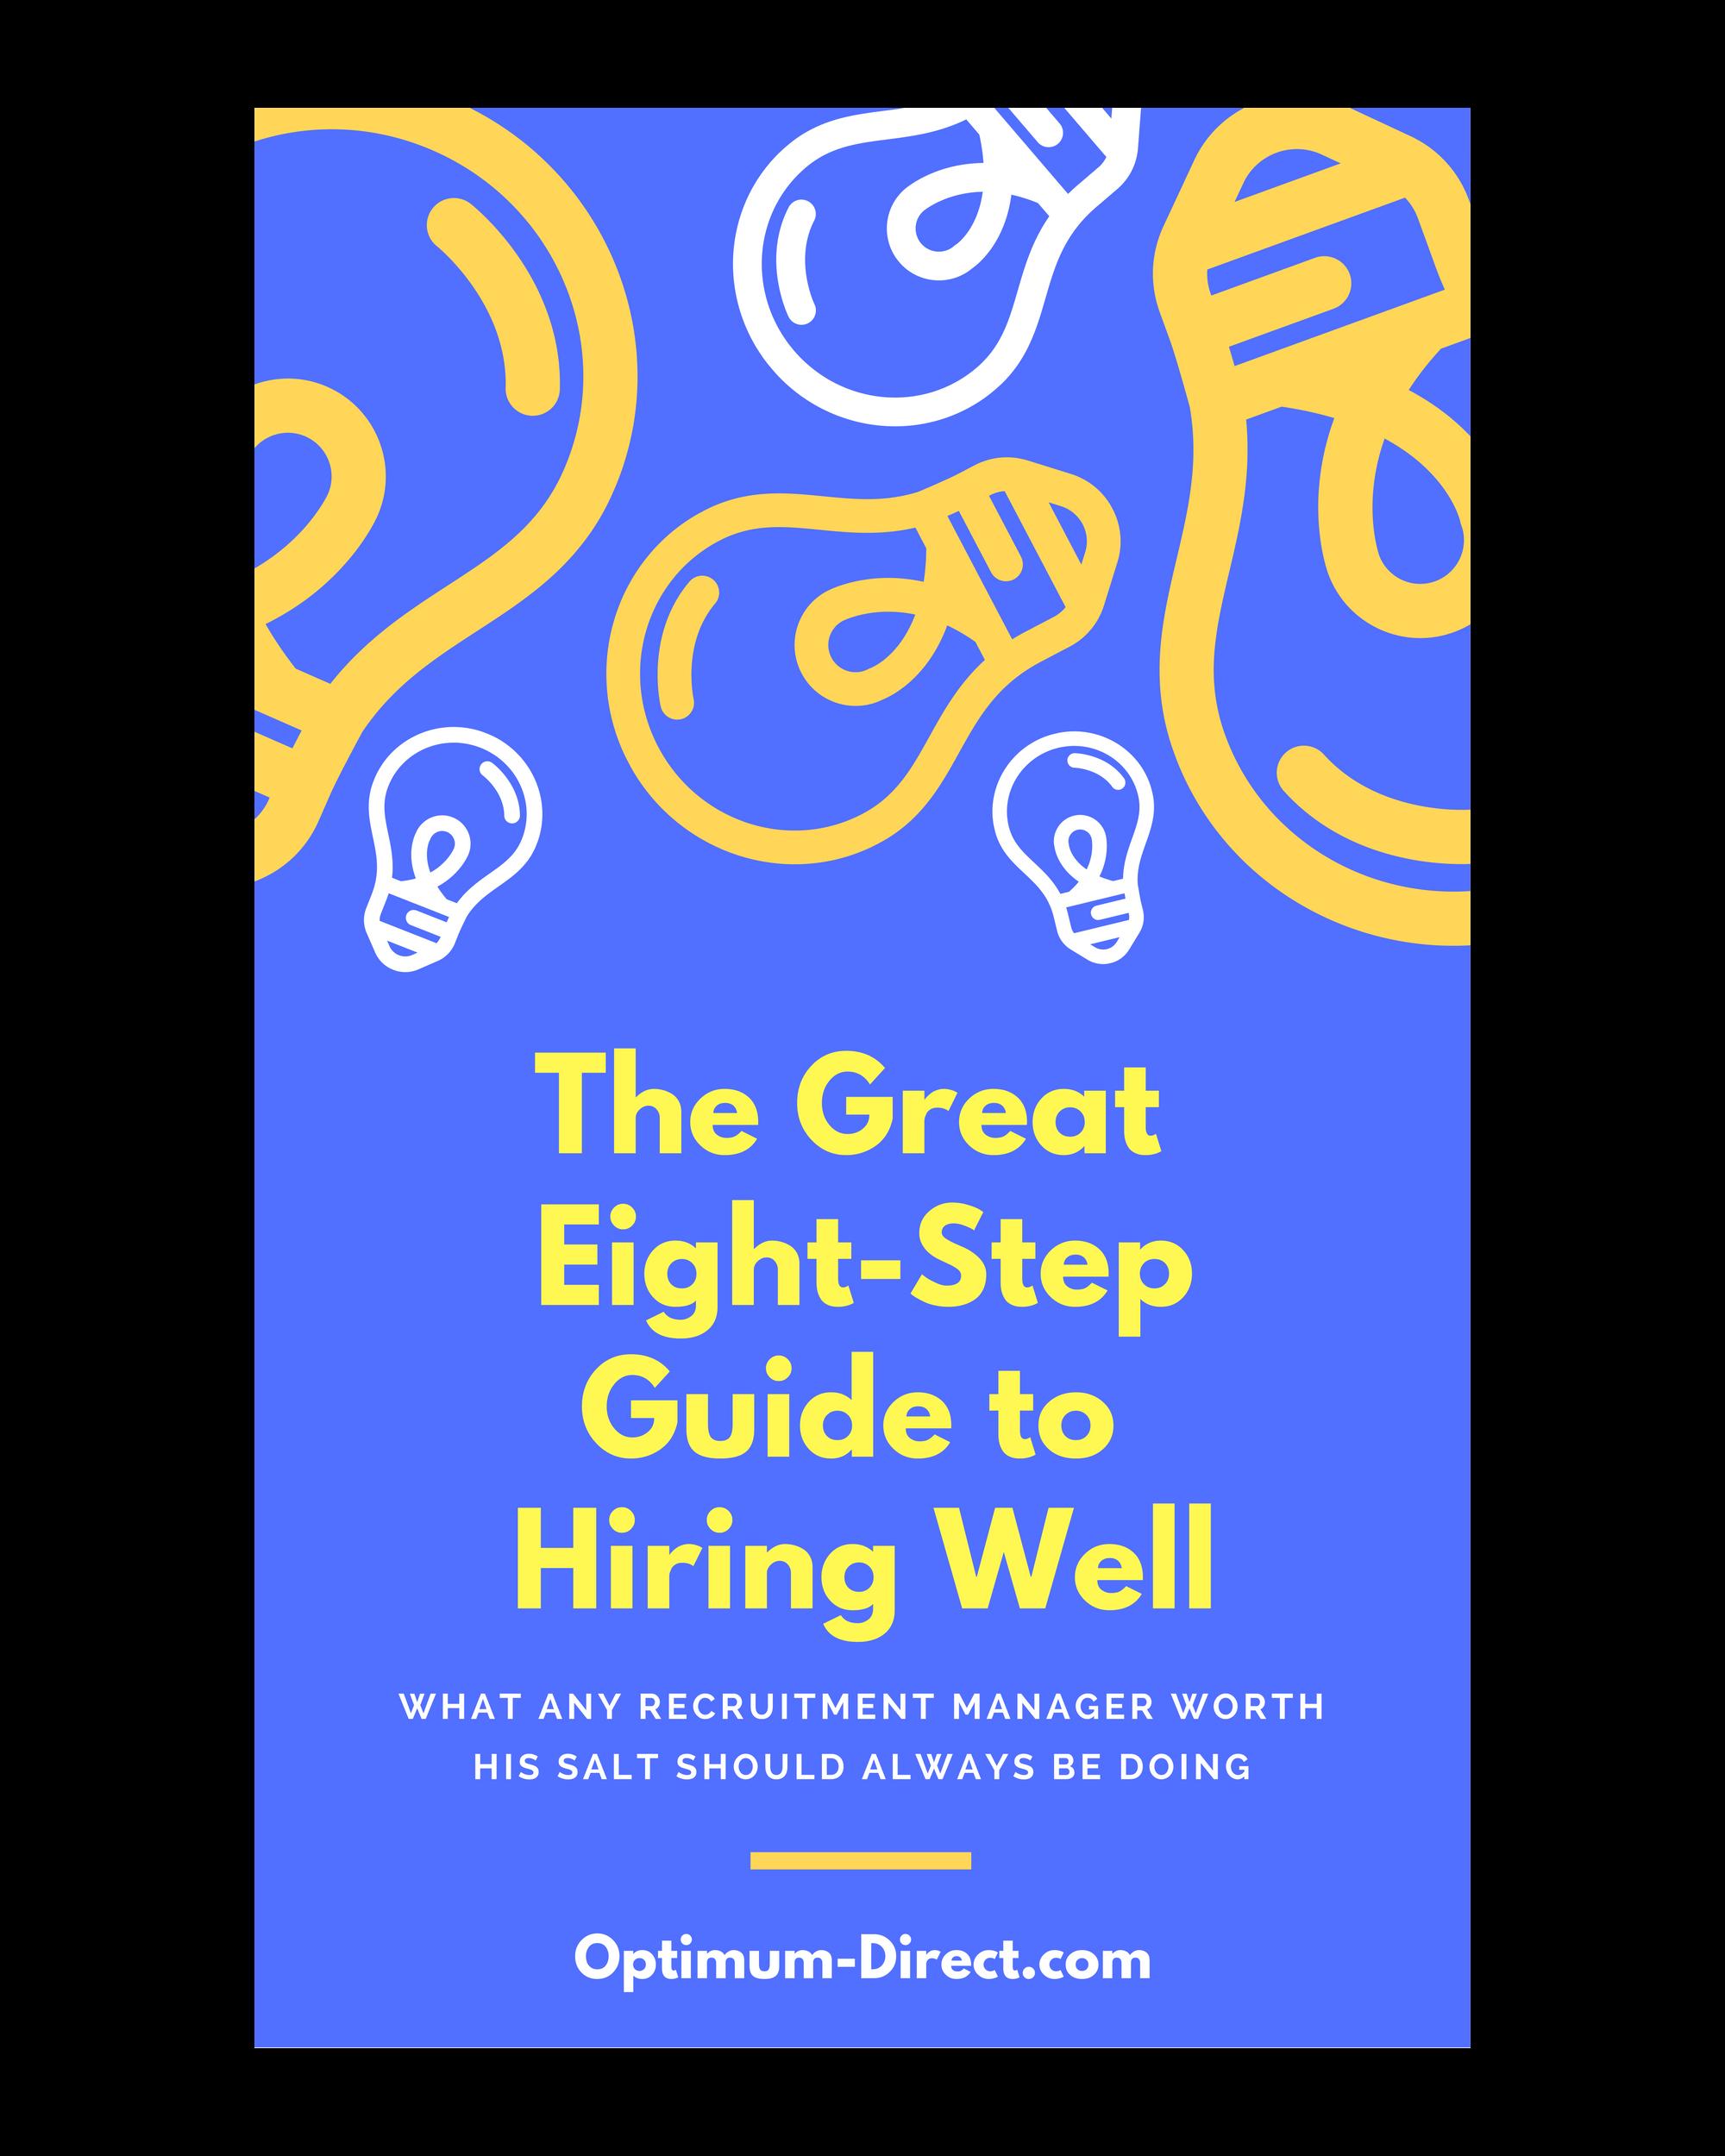 Download this free e-book here at Optimum-Direct.com